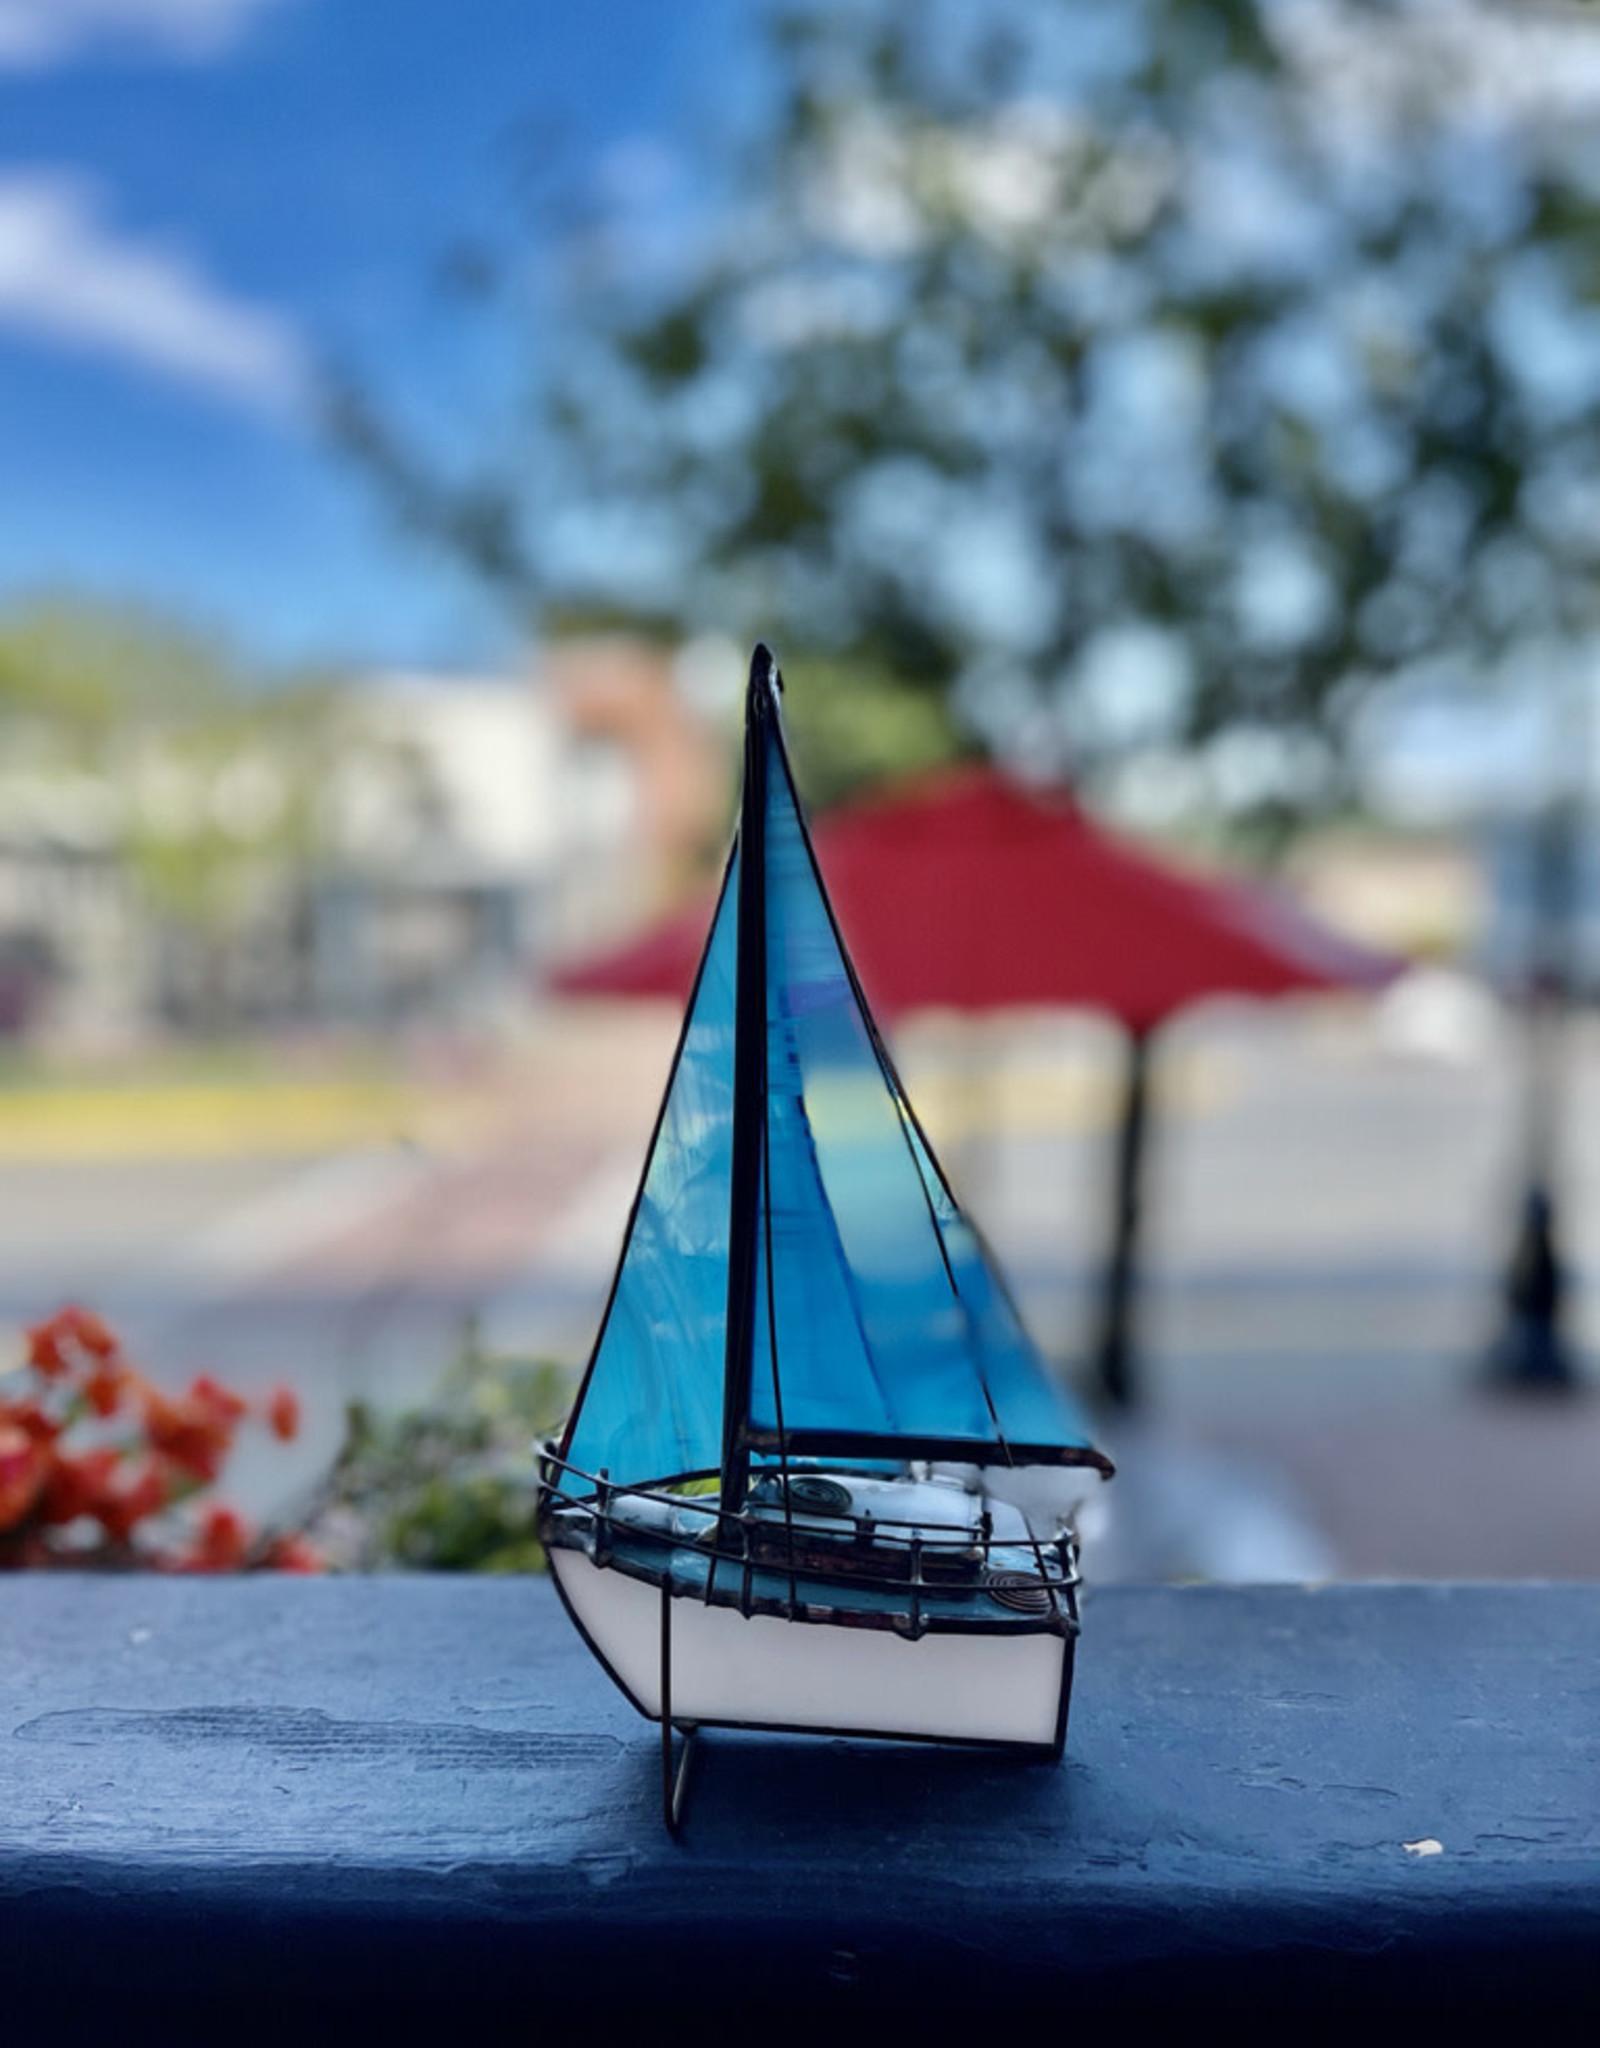 Purple Pigeon Treasures Stain glass Sailboat - Blue